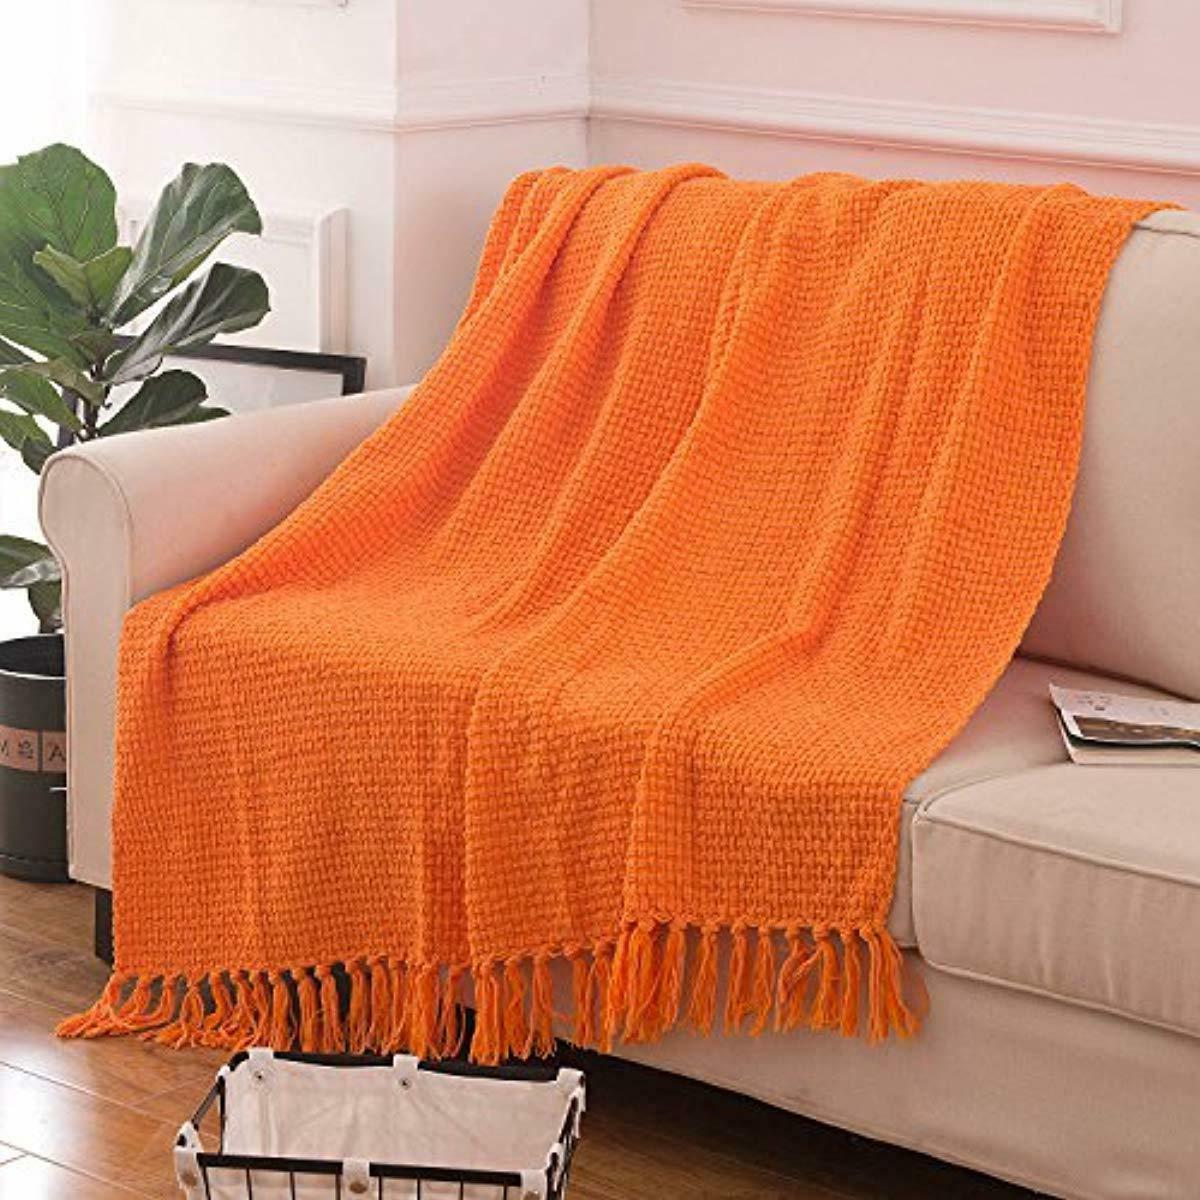 Throw Blanket Orange Woven Pattern